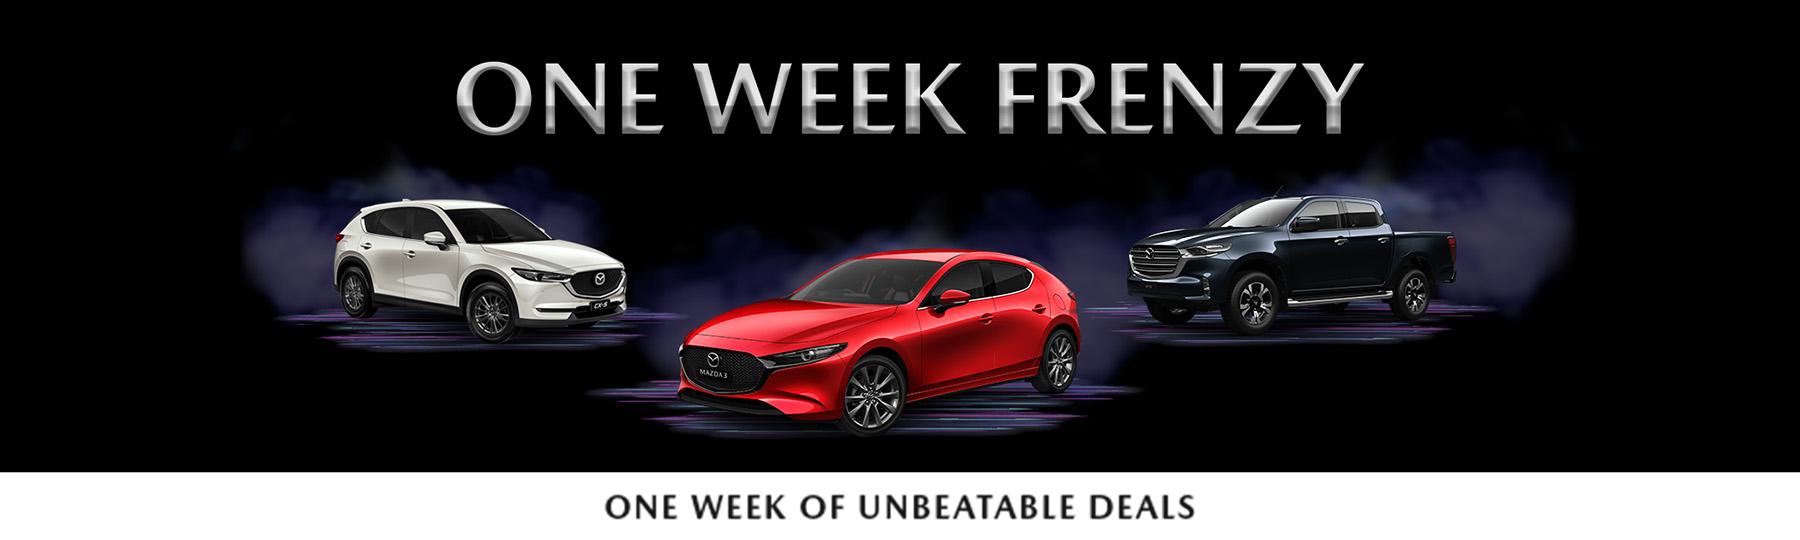 Mazda's One Week Frenzy